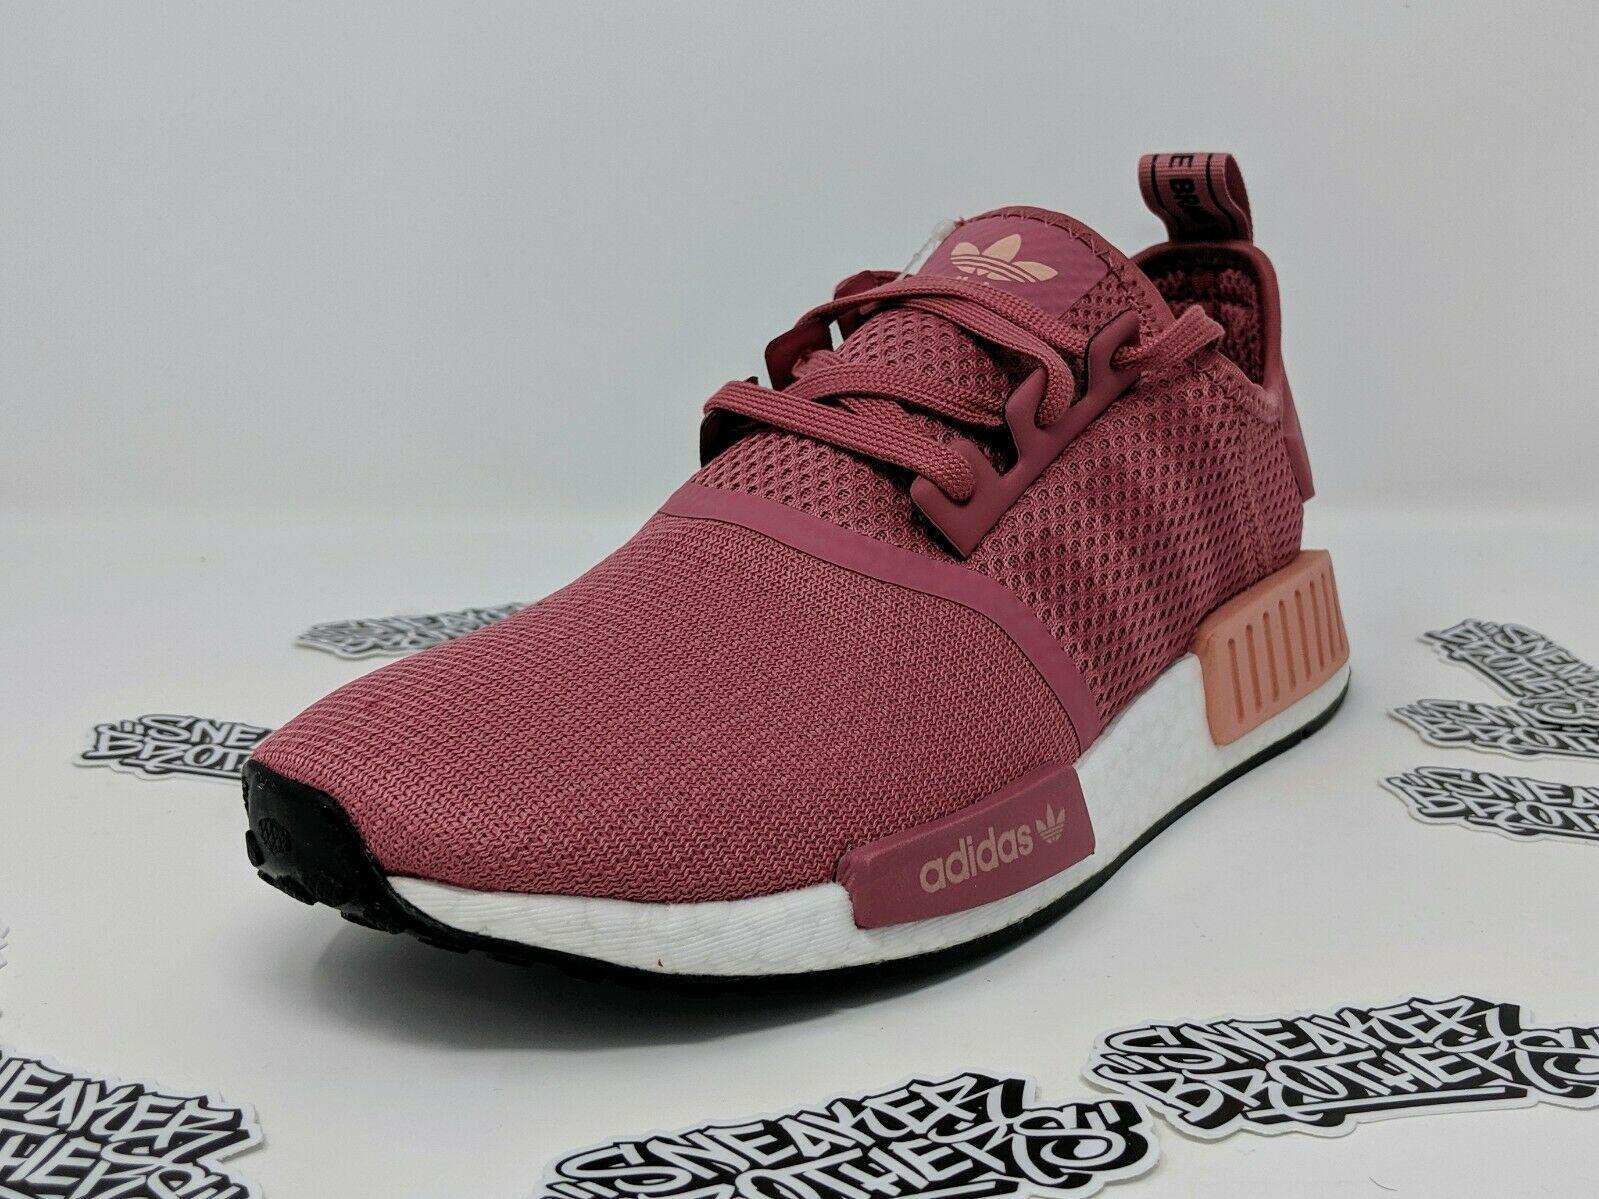 Adidas Women's Originals NMD_R1 Trace